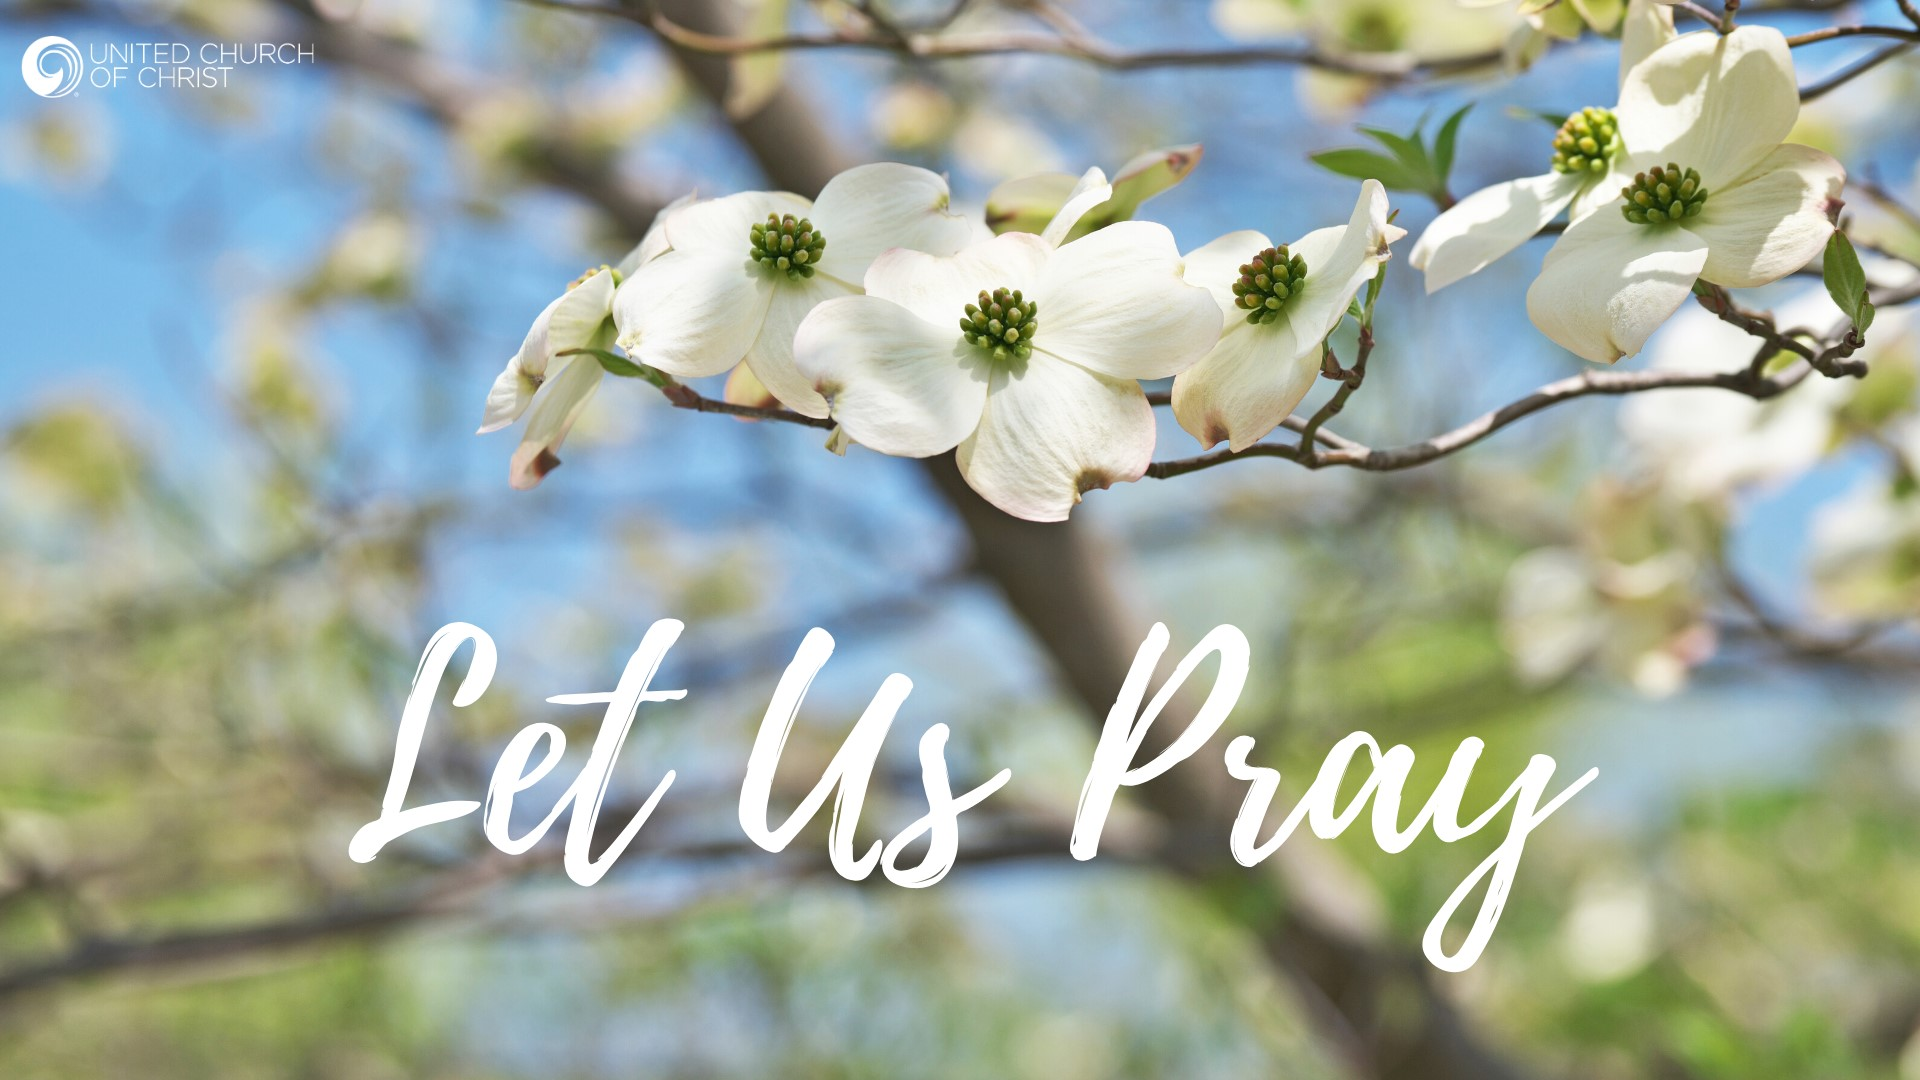 Call to Prayer image 4/5/20